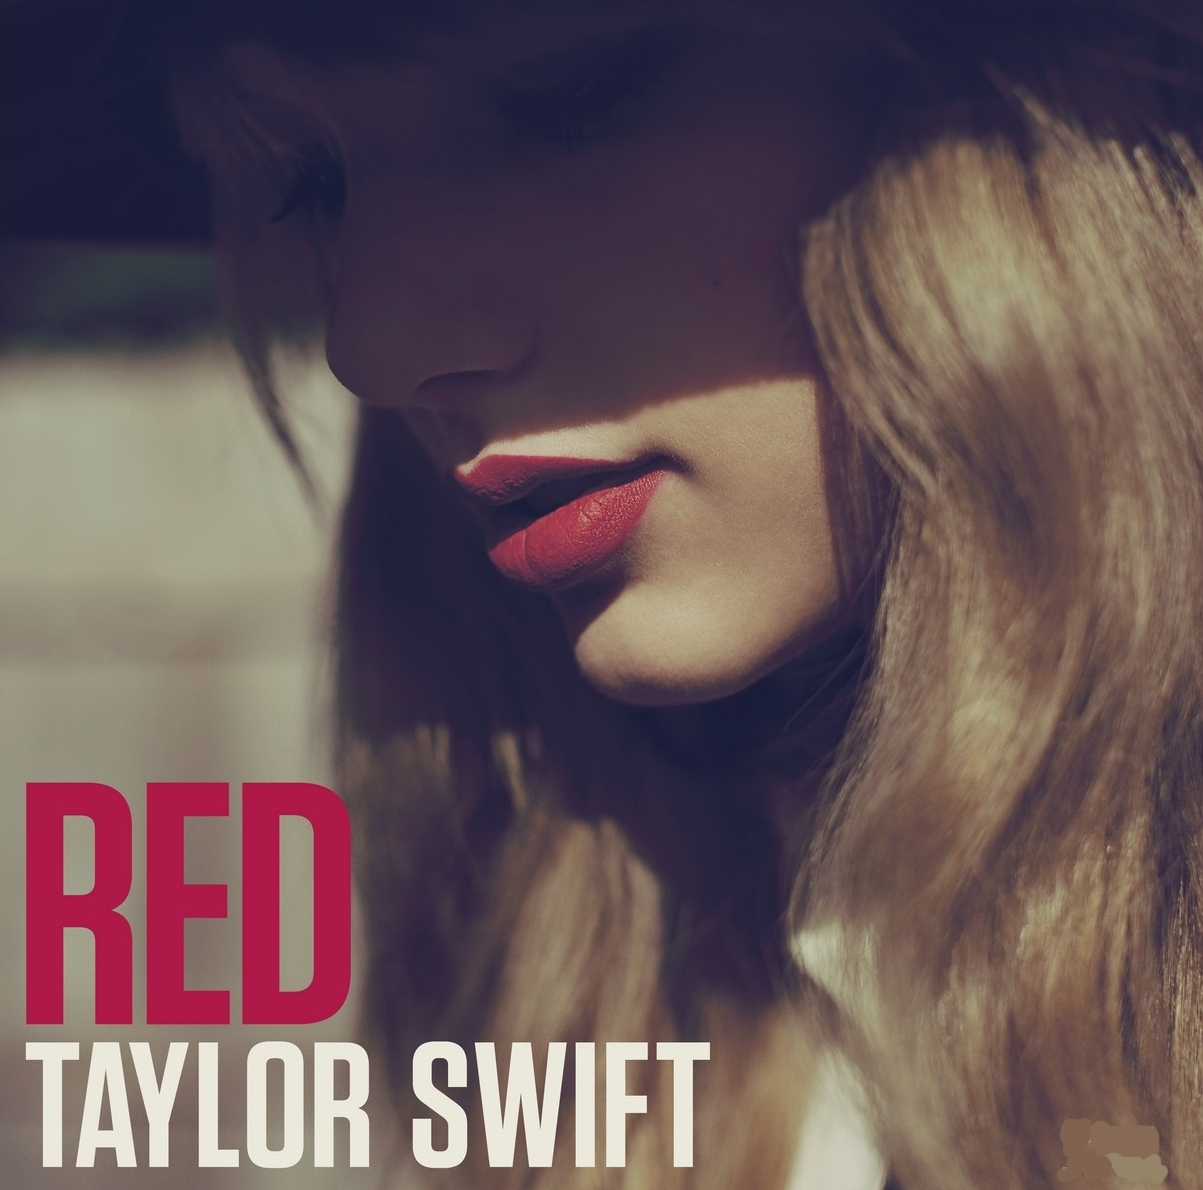 http://4.bp.blogspot.com/-fHzqR29Kqaw/UIU53g9FYHI/AAAAAAAAJRA/OXzAD33oSm8/s1600/Taylor+Swift+-+Red.jpeg